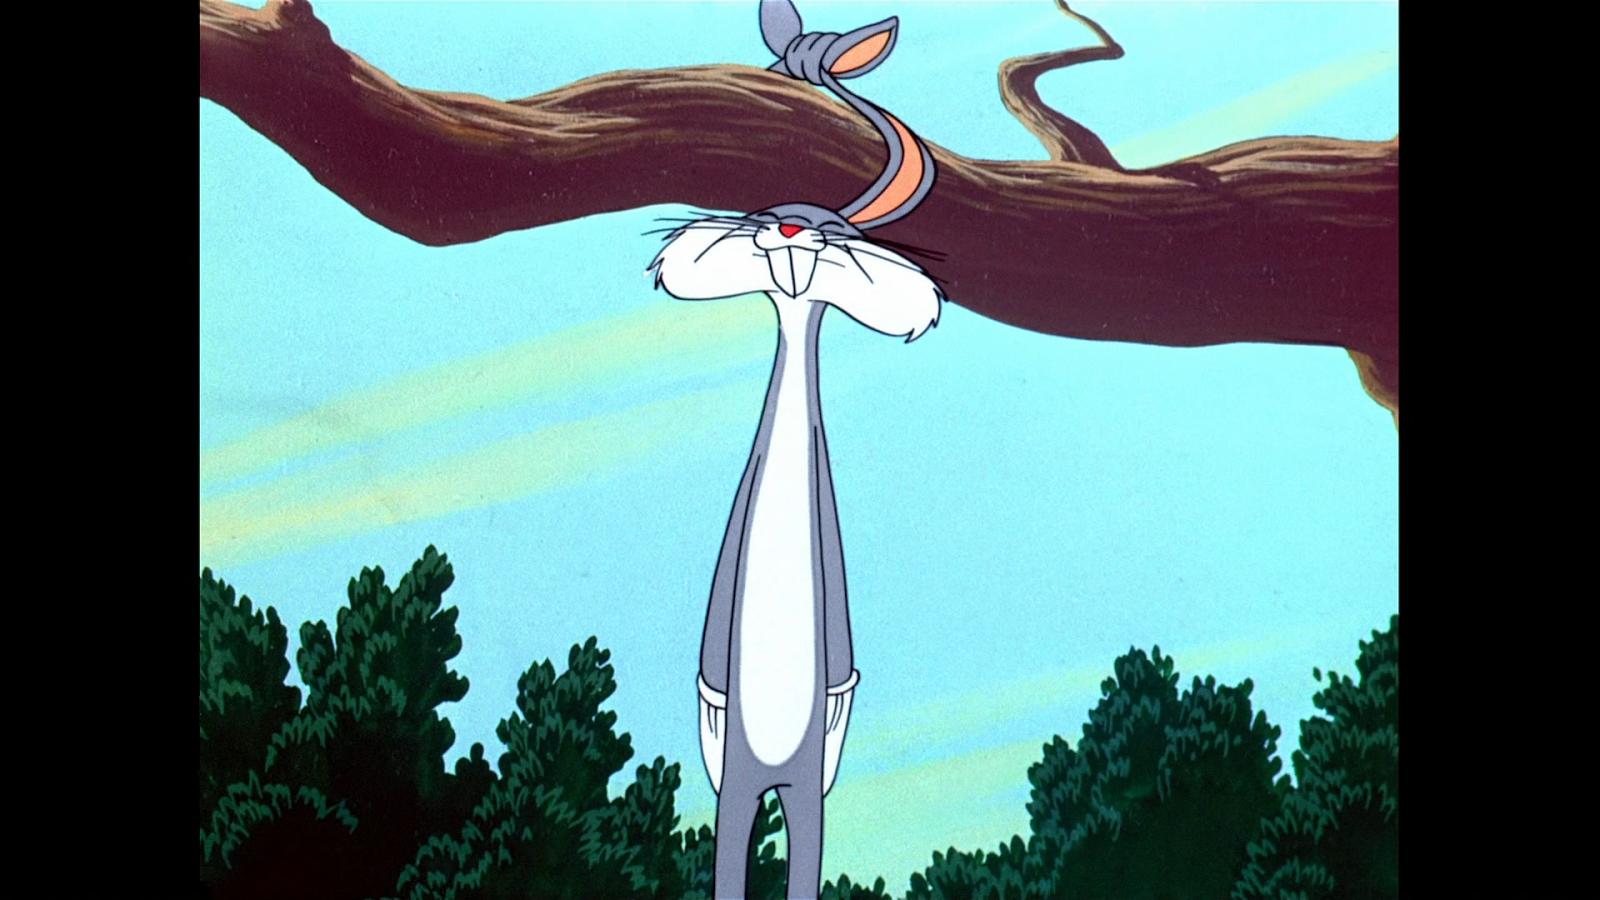 Looney Tunes Platinum Collection (1936-1966) 1080p BD25 3